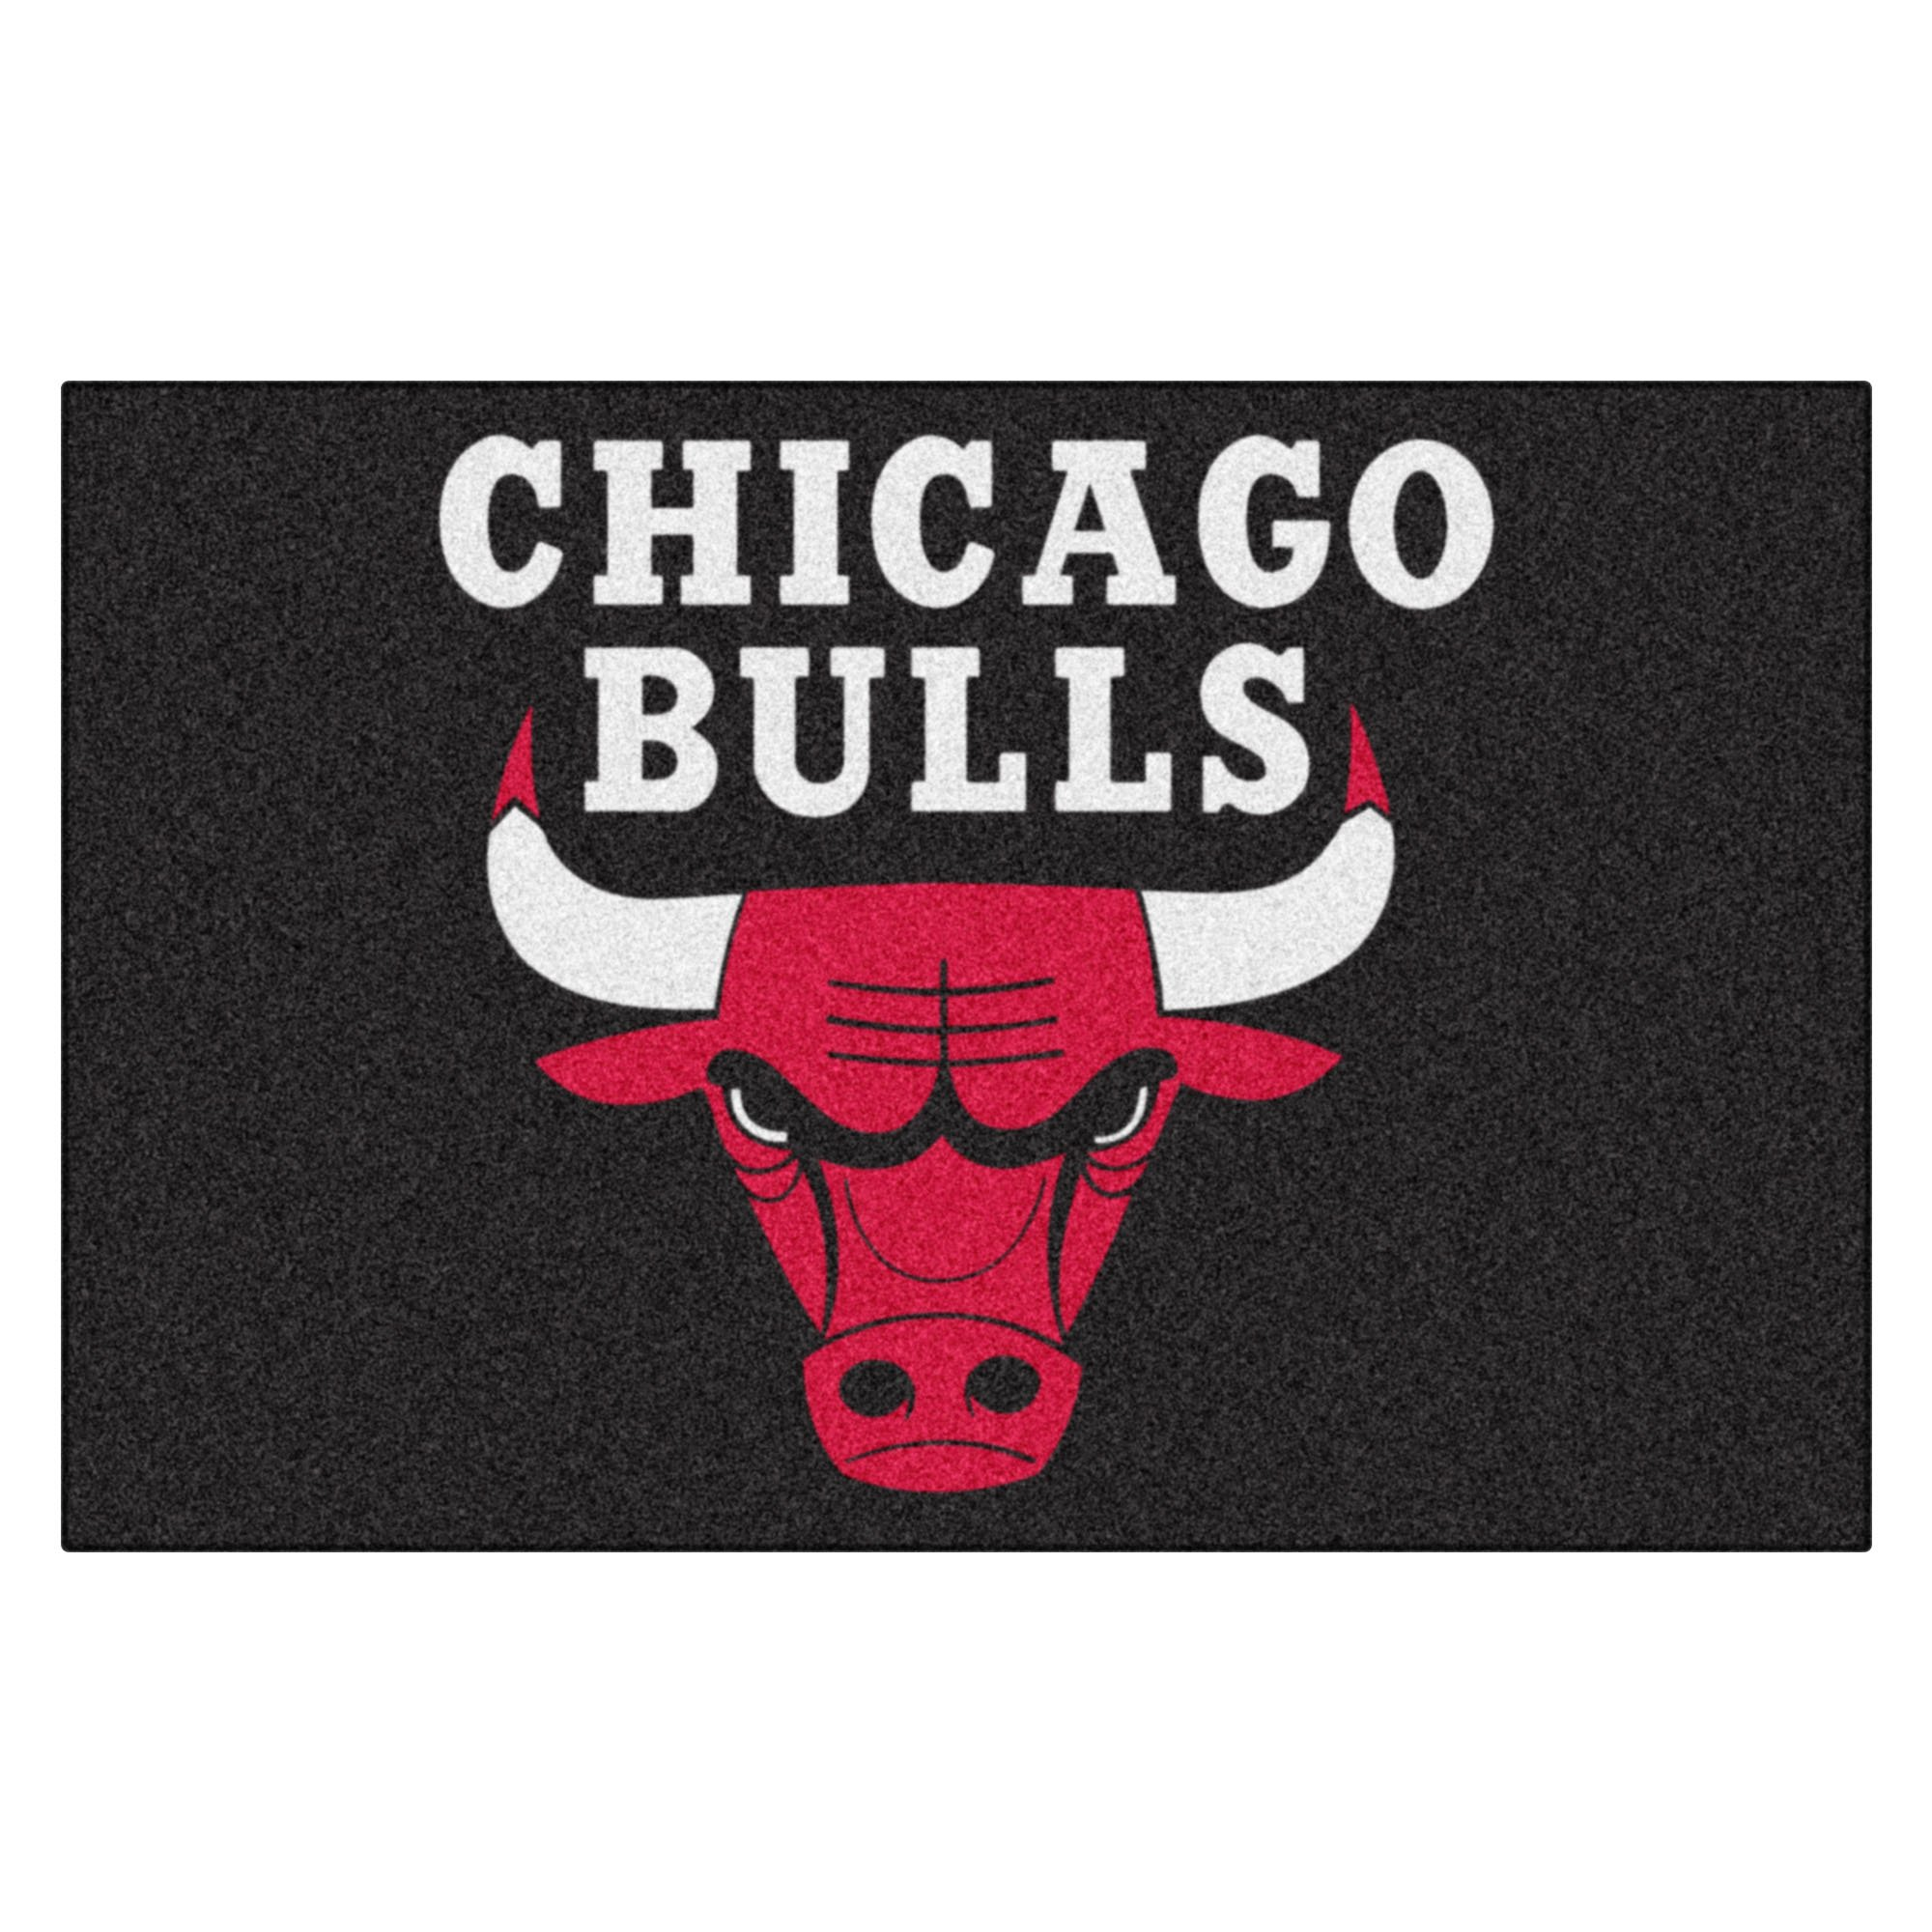 FANMATS 11902 NBA Chicago Bulls Nylon Face Starter Rug , 19''x30'' by Fanmats